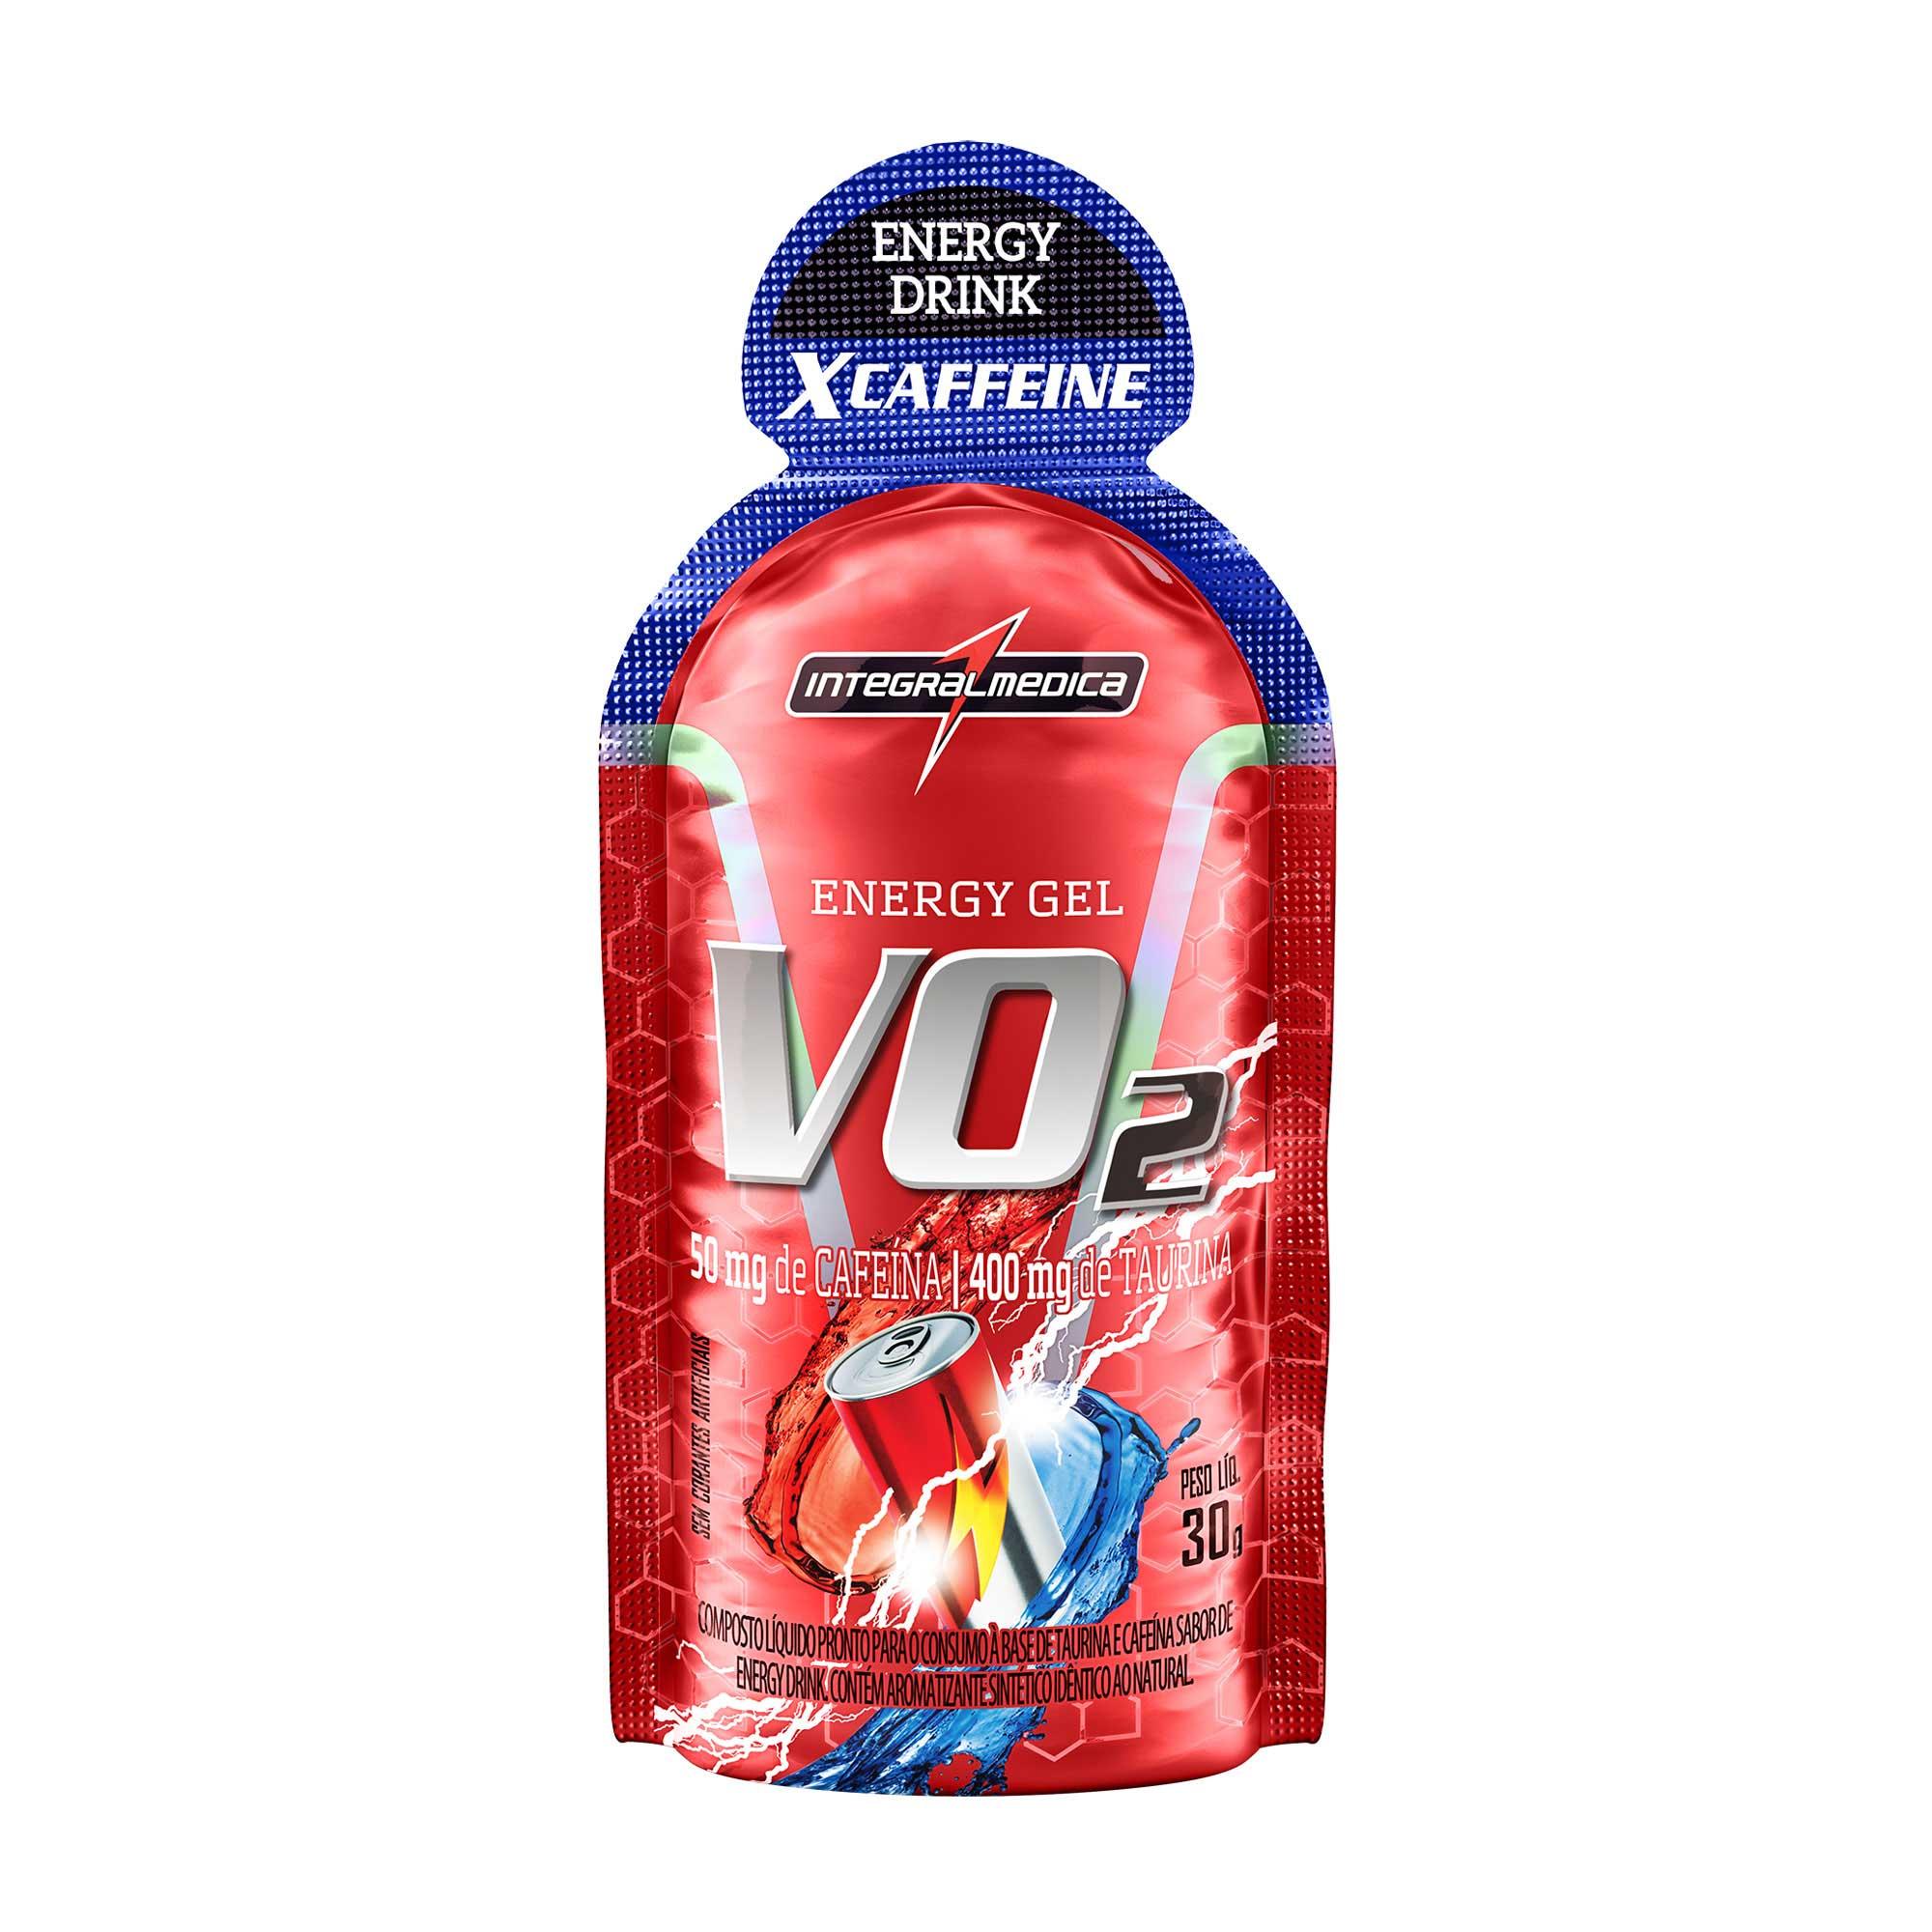 VO2 Gel Energético X-Caffeine Energy Drink 30g Integralmedica